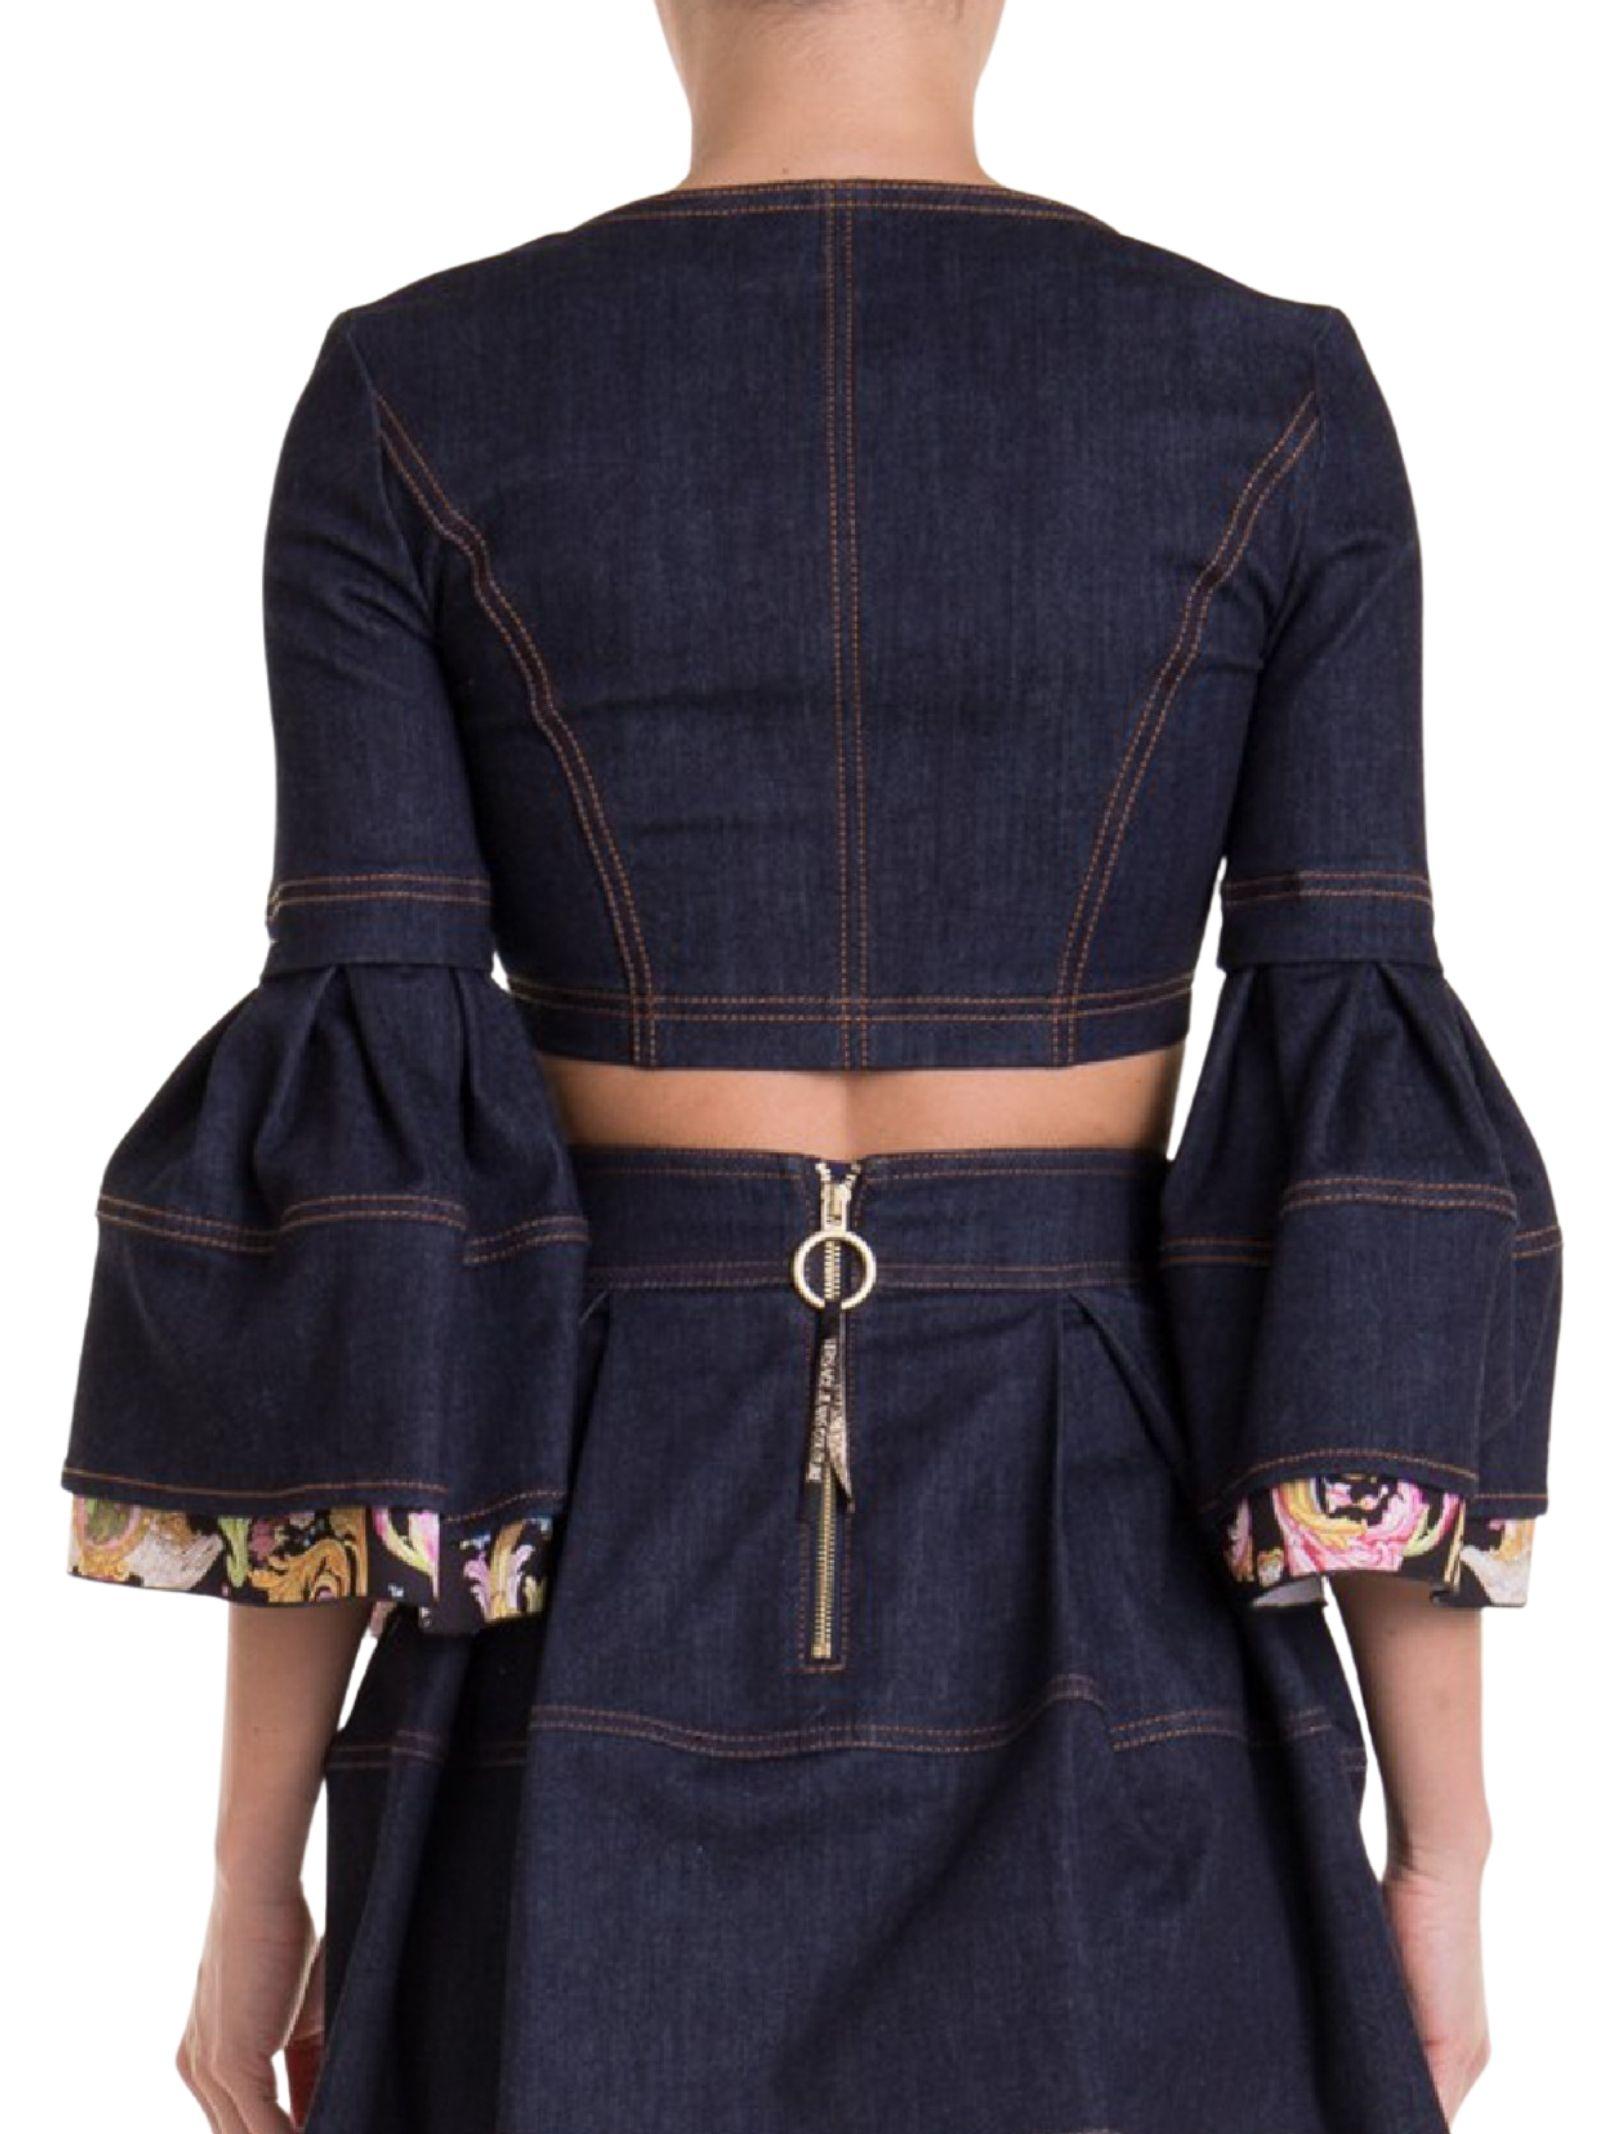 Blouson in denim VERSACE Jeans | D3HWA65ARARH00904